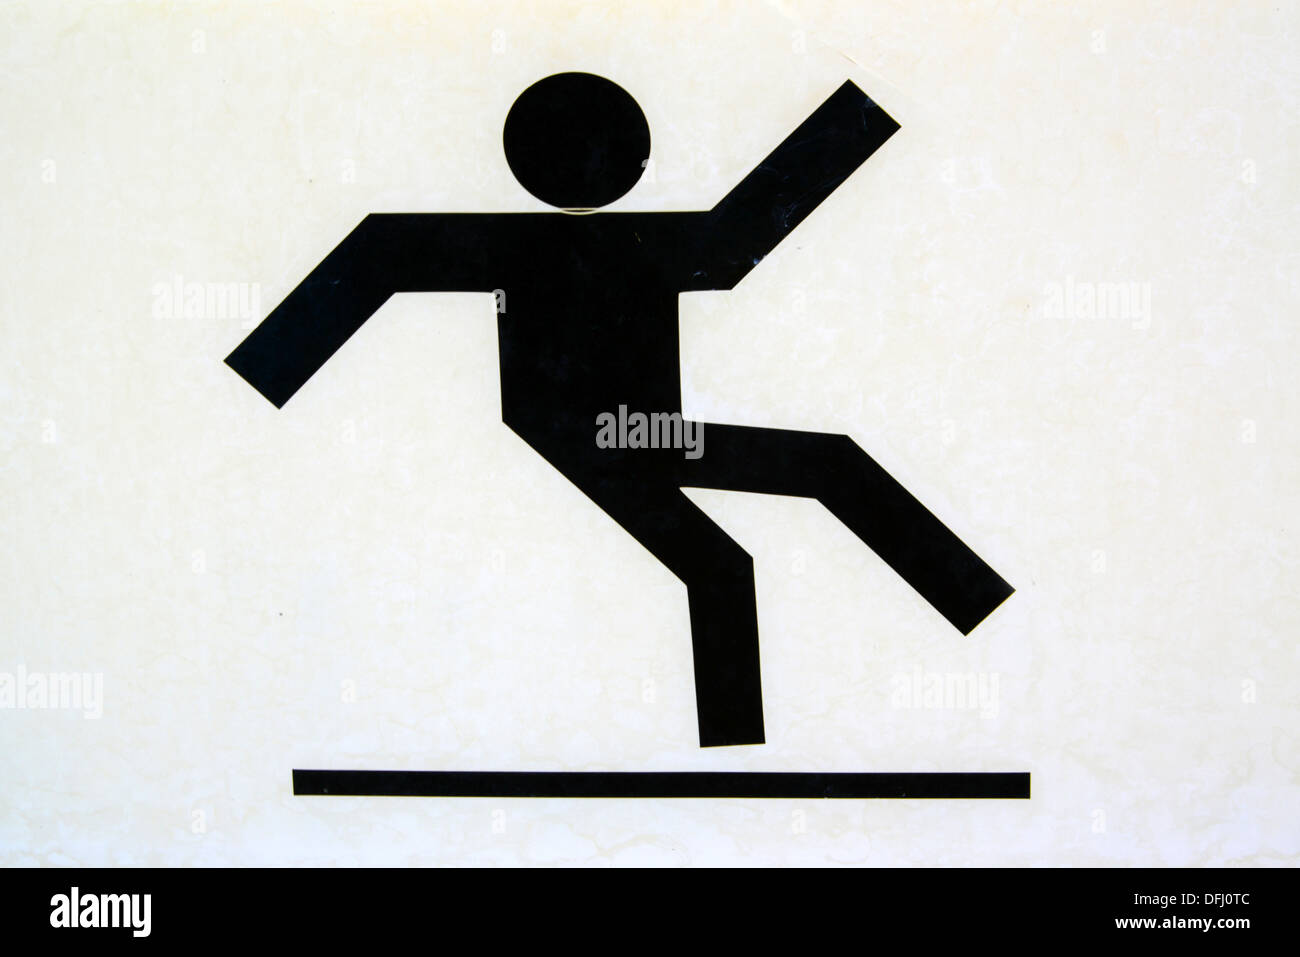 Warning sign.'Slippery surface'. - Stock Image